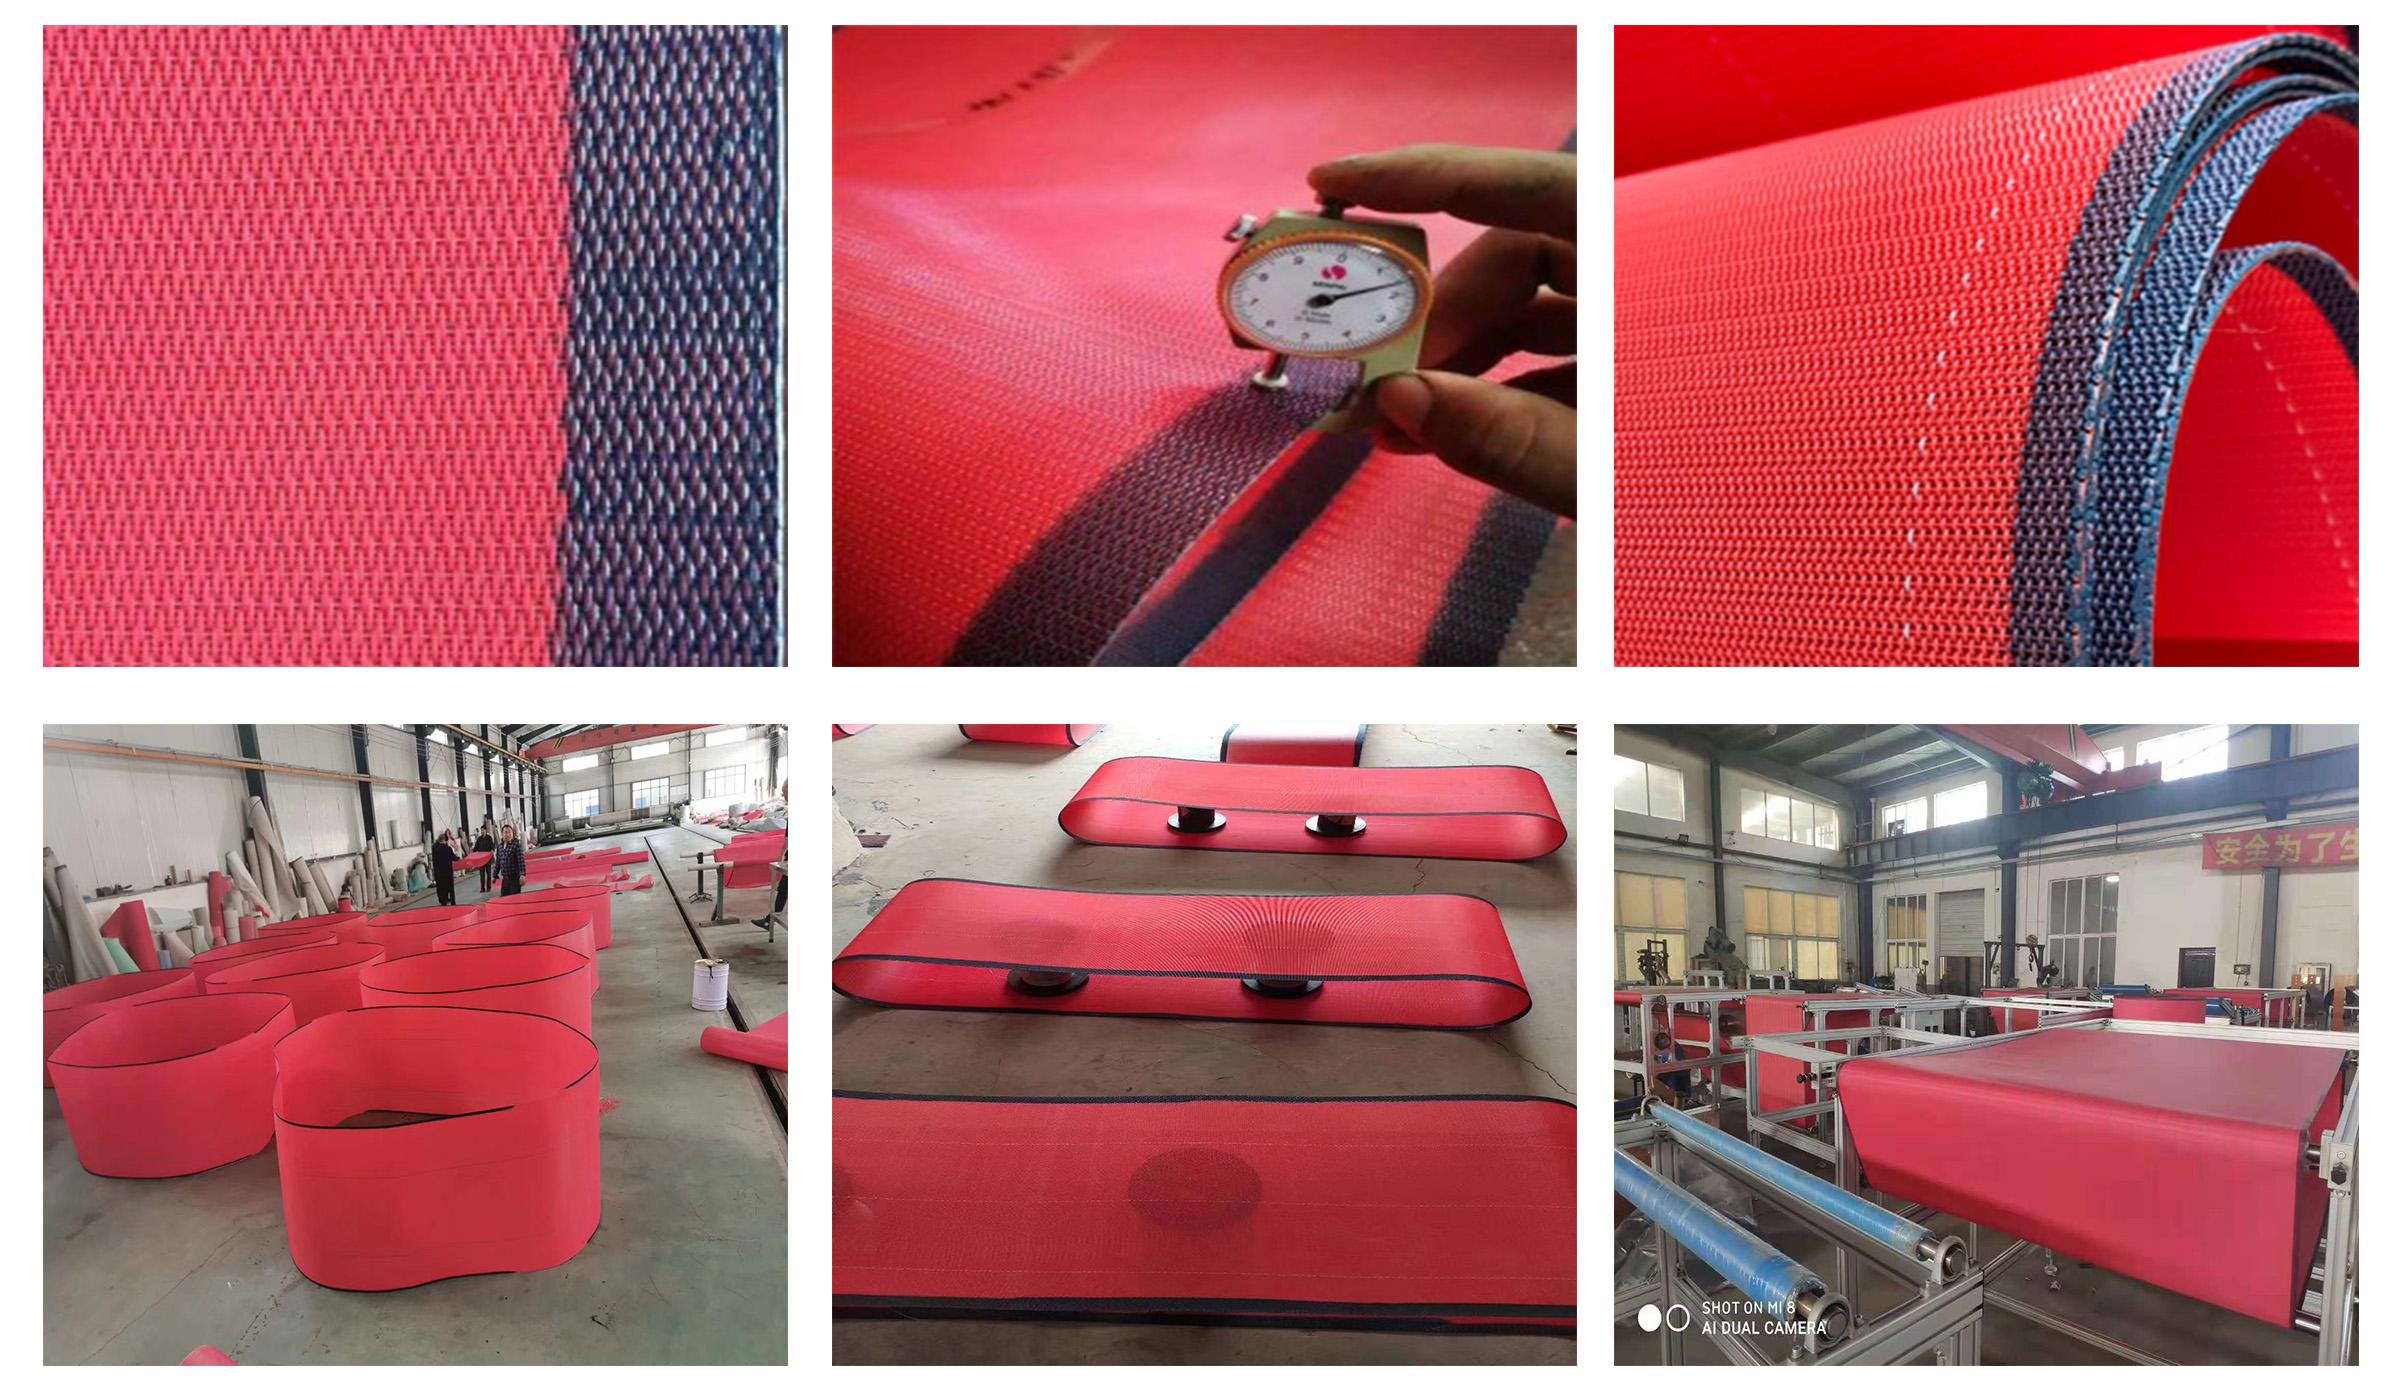 2-Meltblown coneyor belt